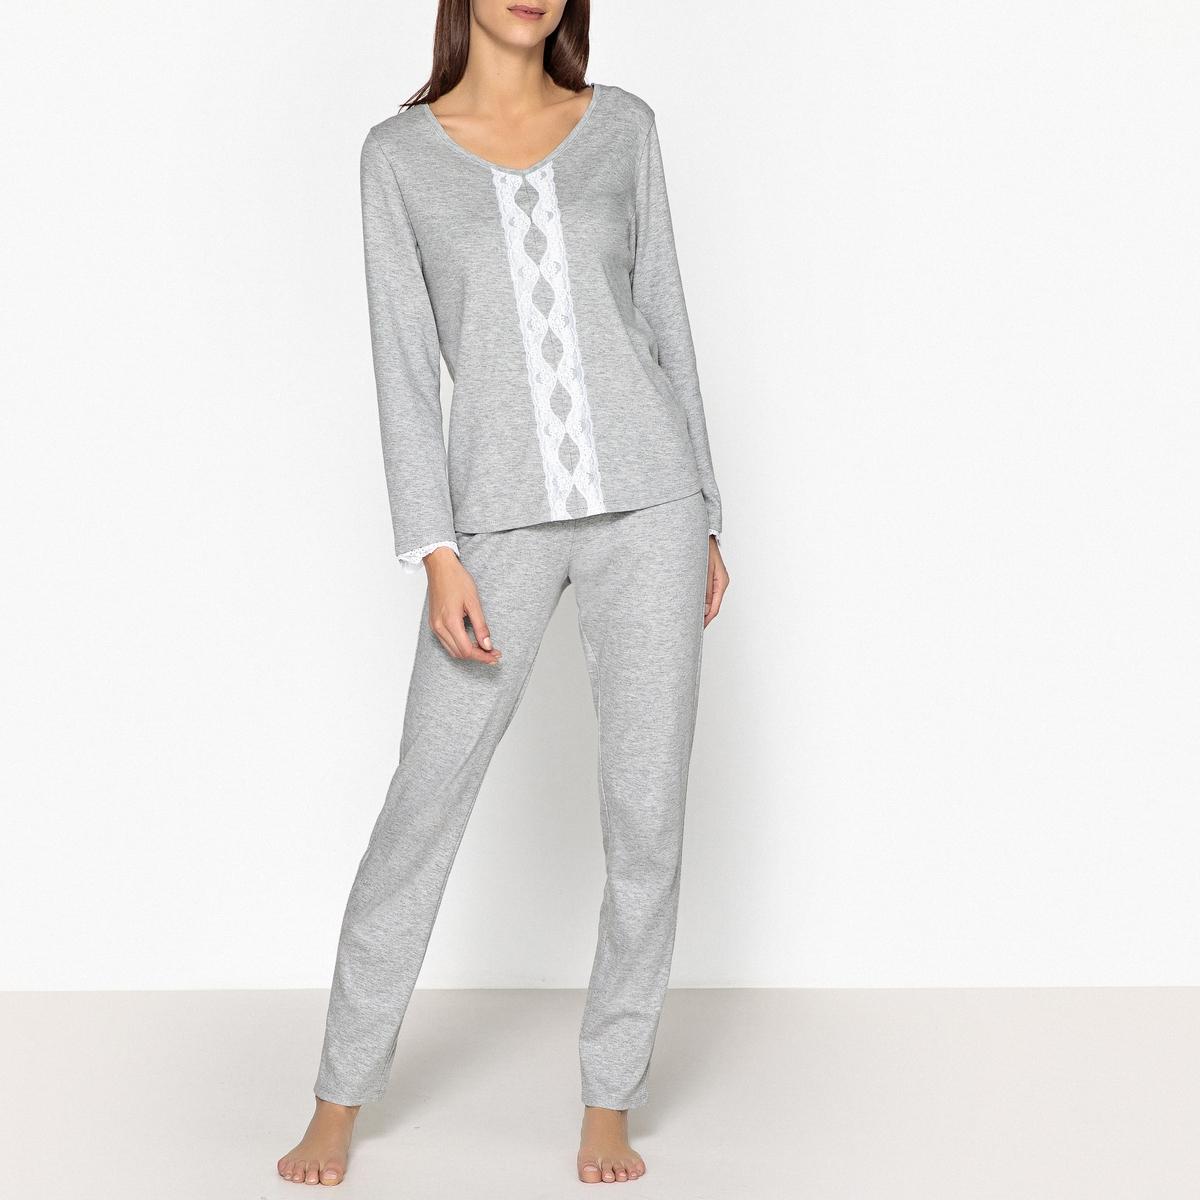 Пижама со вставками из кружева пижама из майки и шортов из модала и кружева romy